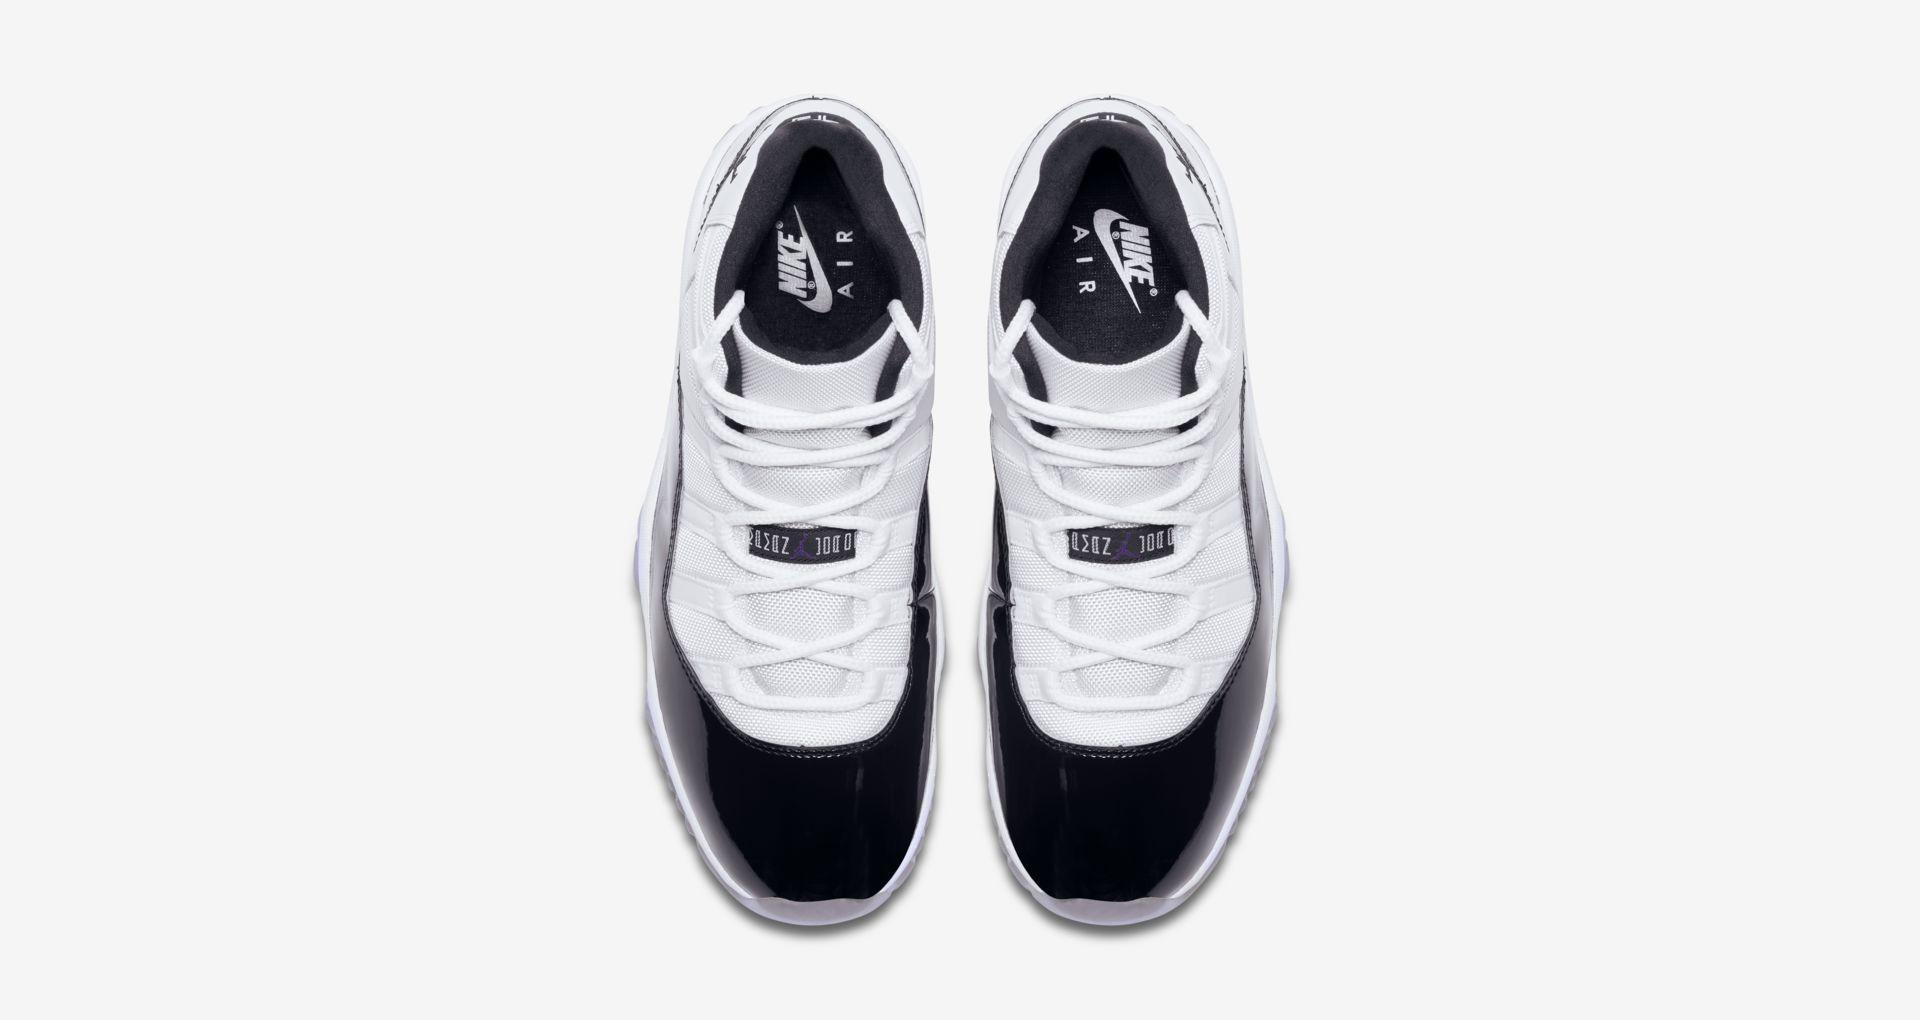 378037 100 Air Jordan 11 Retro Concord 4